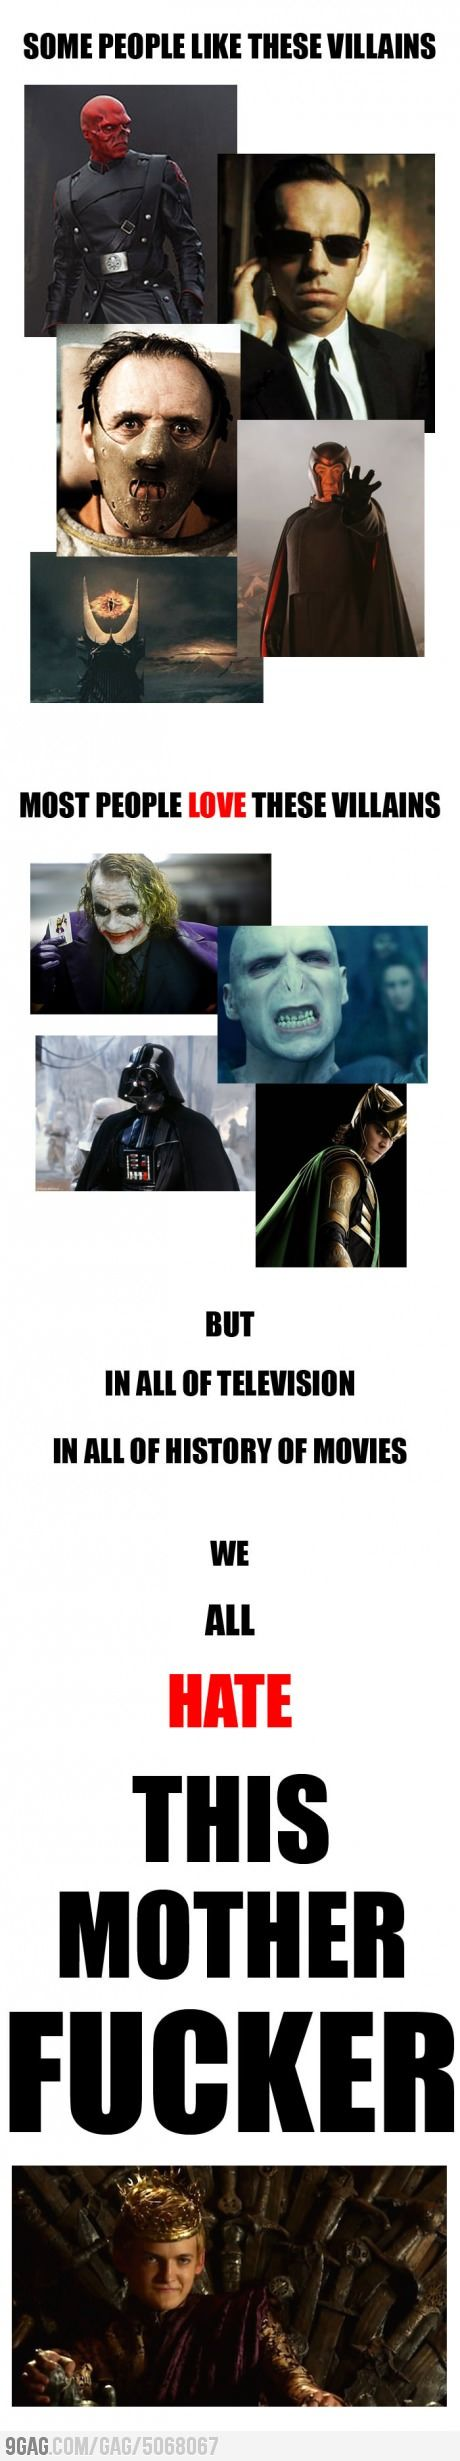 TRUTH: Stuff, Truth, Gameofthrones, Funny, So True, Humor, Game Of Thrones